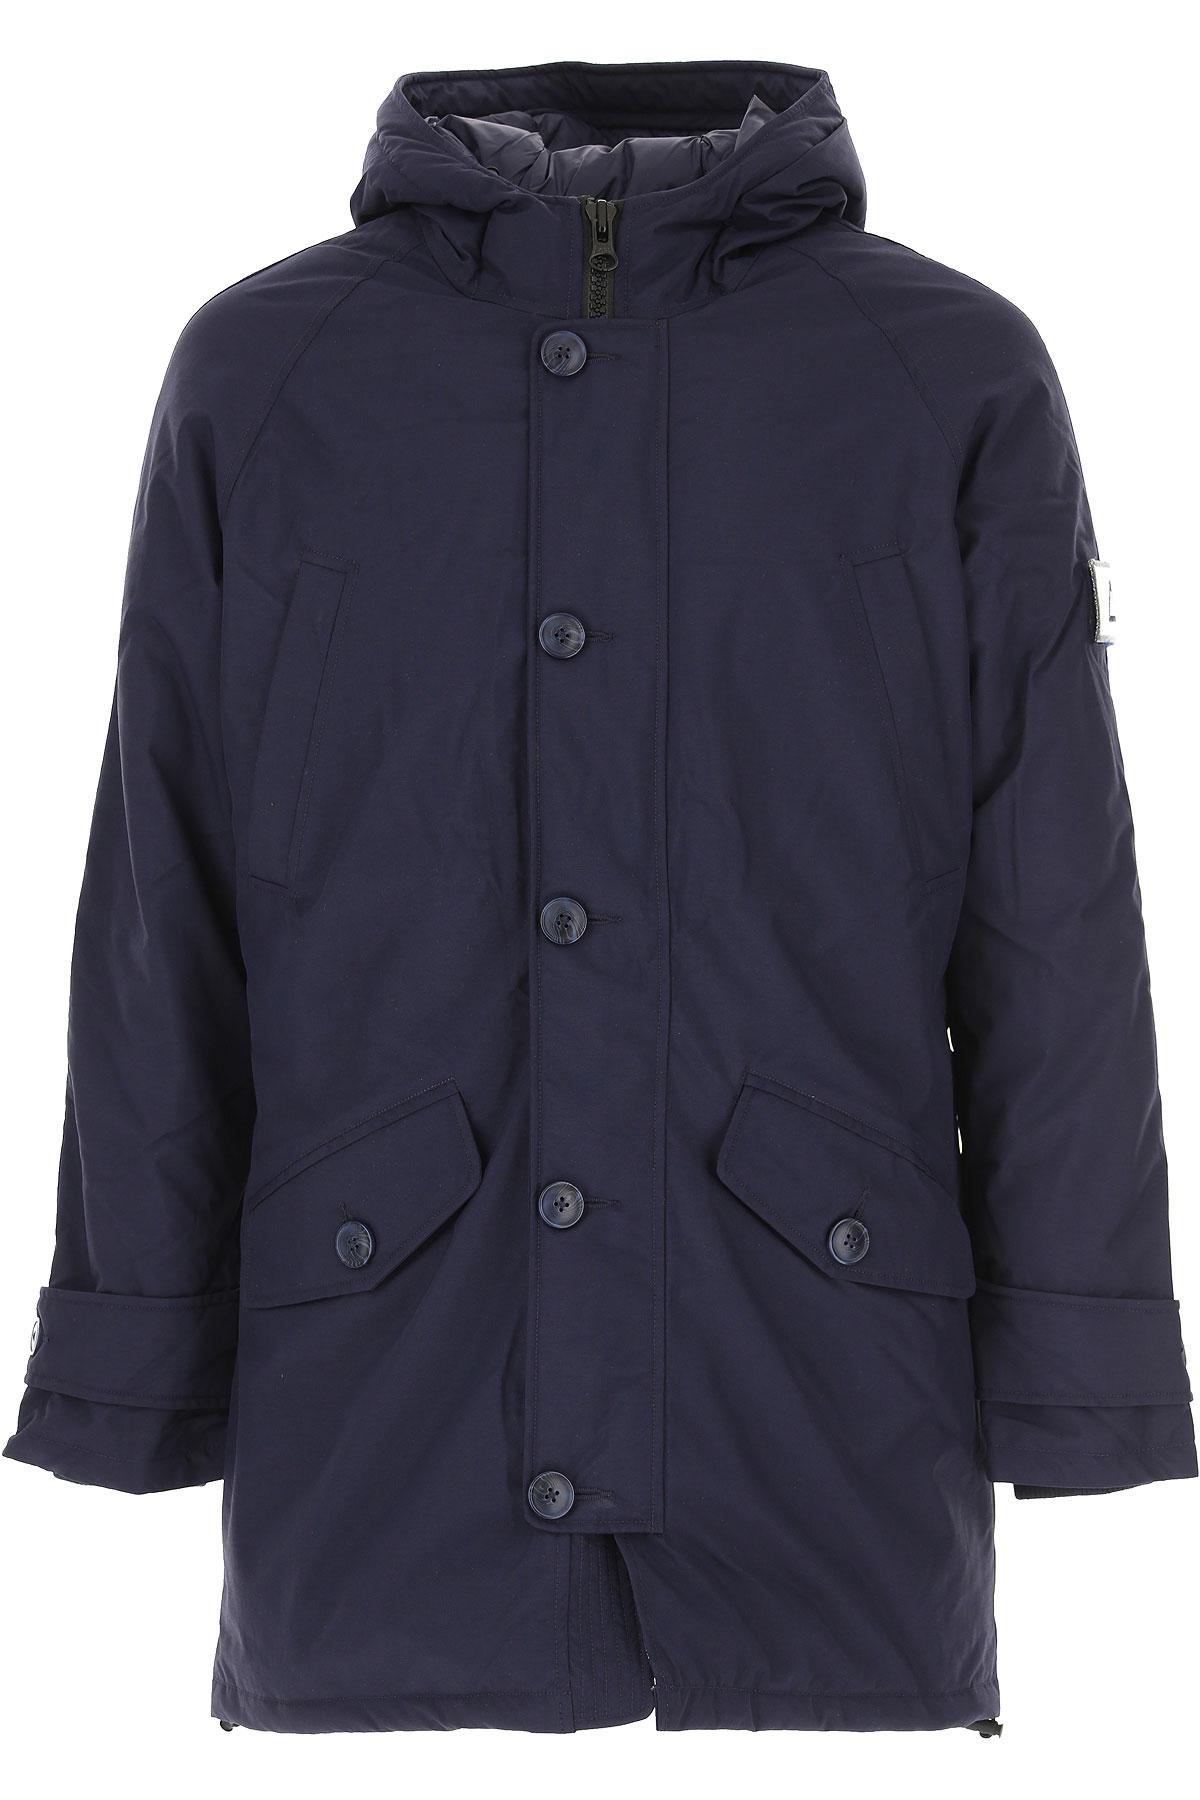 Sun68 Down Jacket for Men, Puffer Ski Jacket On Sale, Navy Blue, polyester, 2019, L M XL XXL